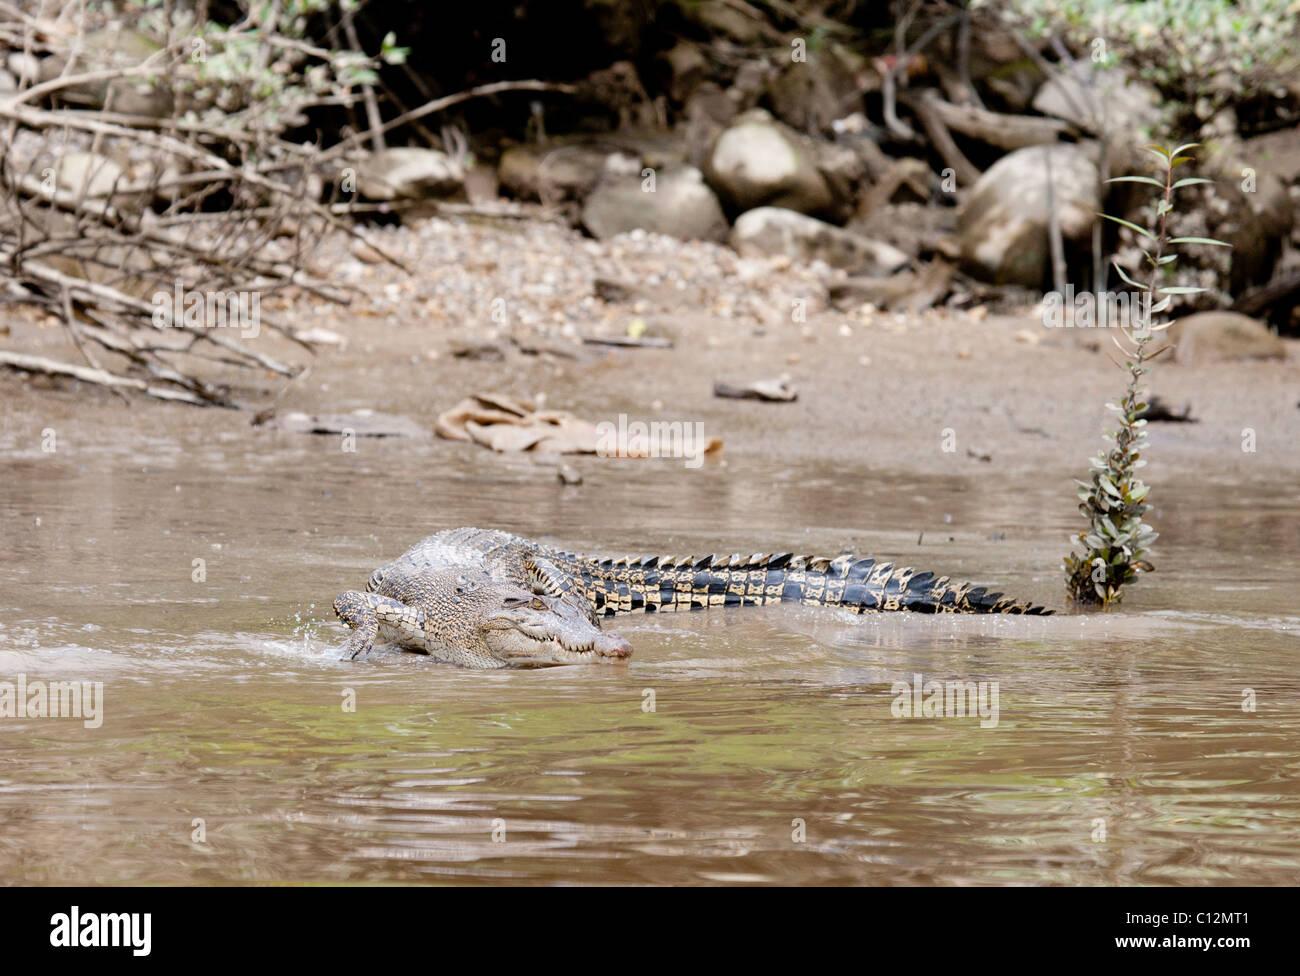 Salt Water Crocodile - Stock Image